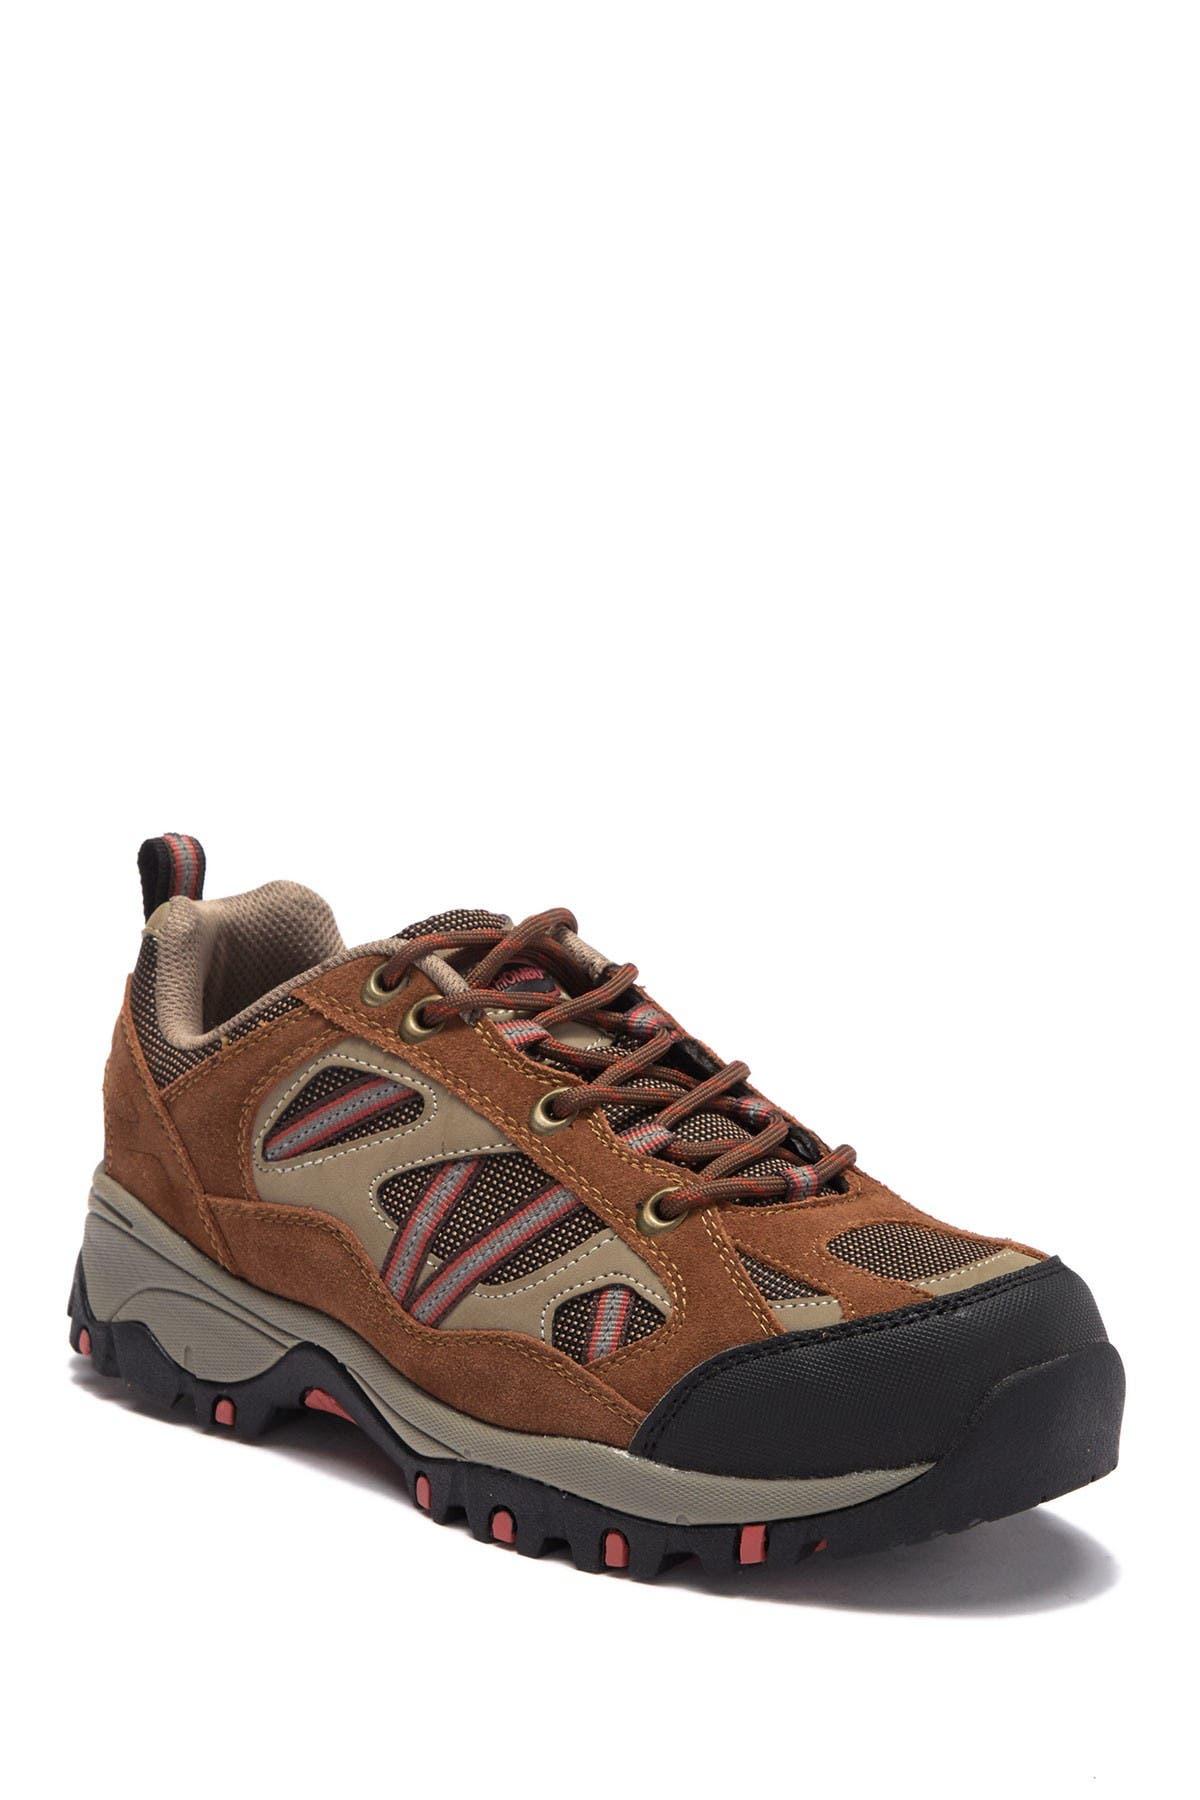 Khombu | Wally Hiking Sneaker